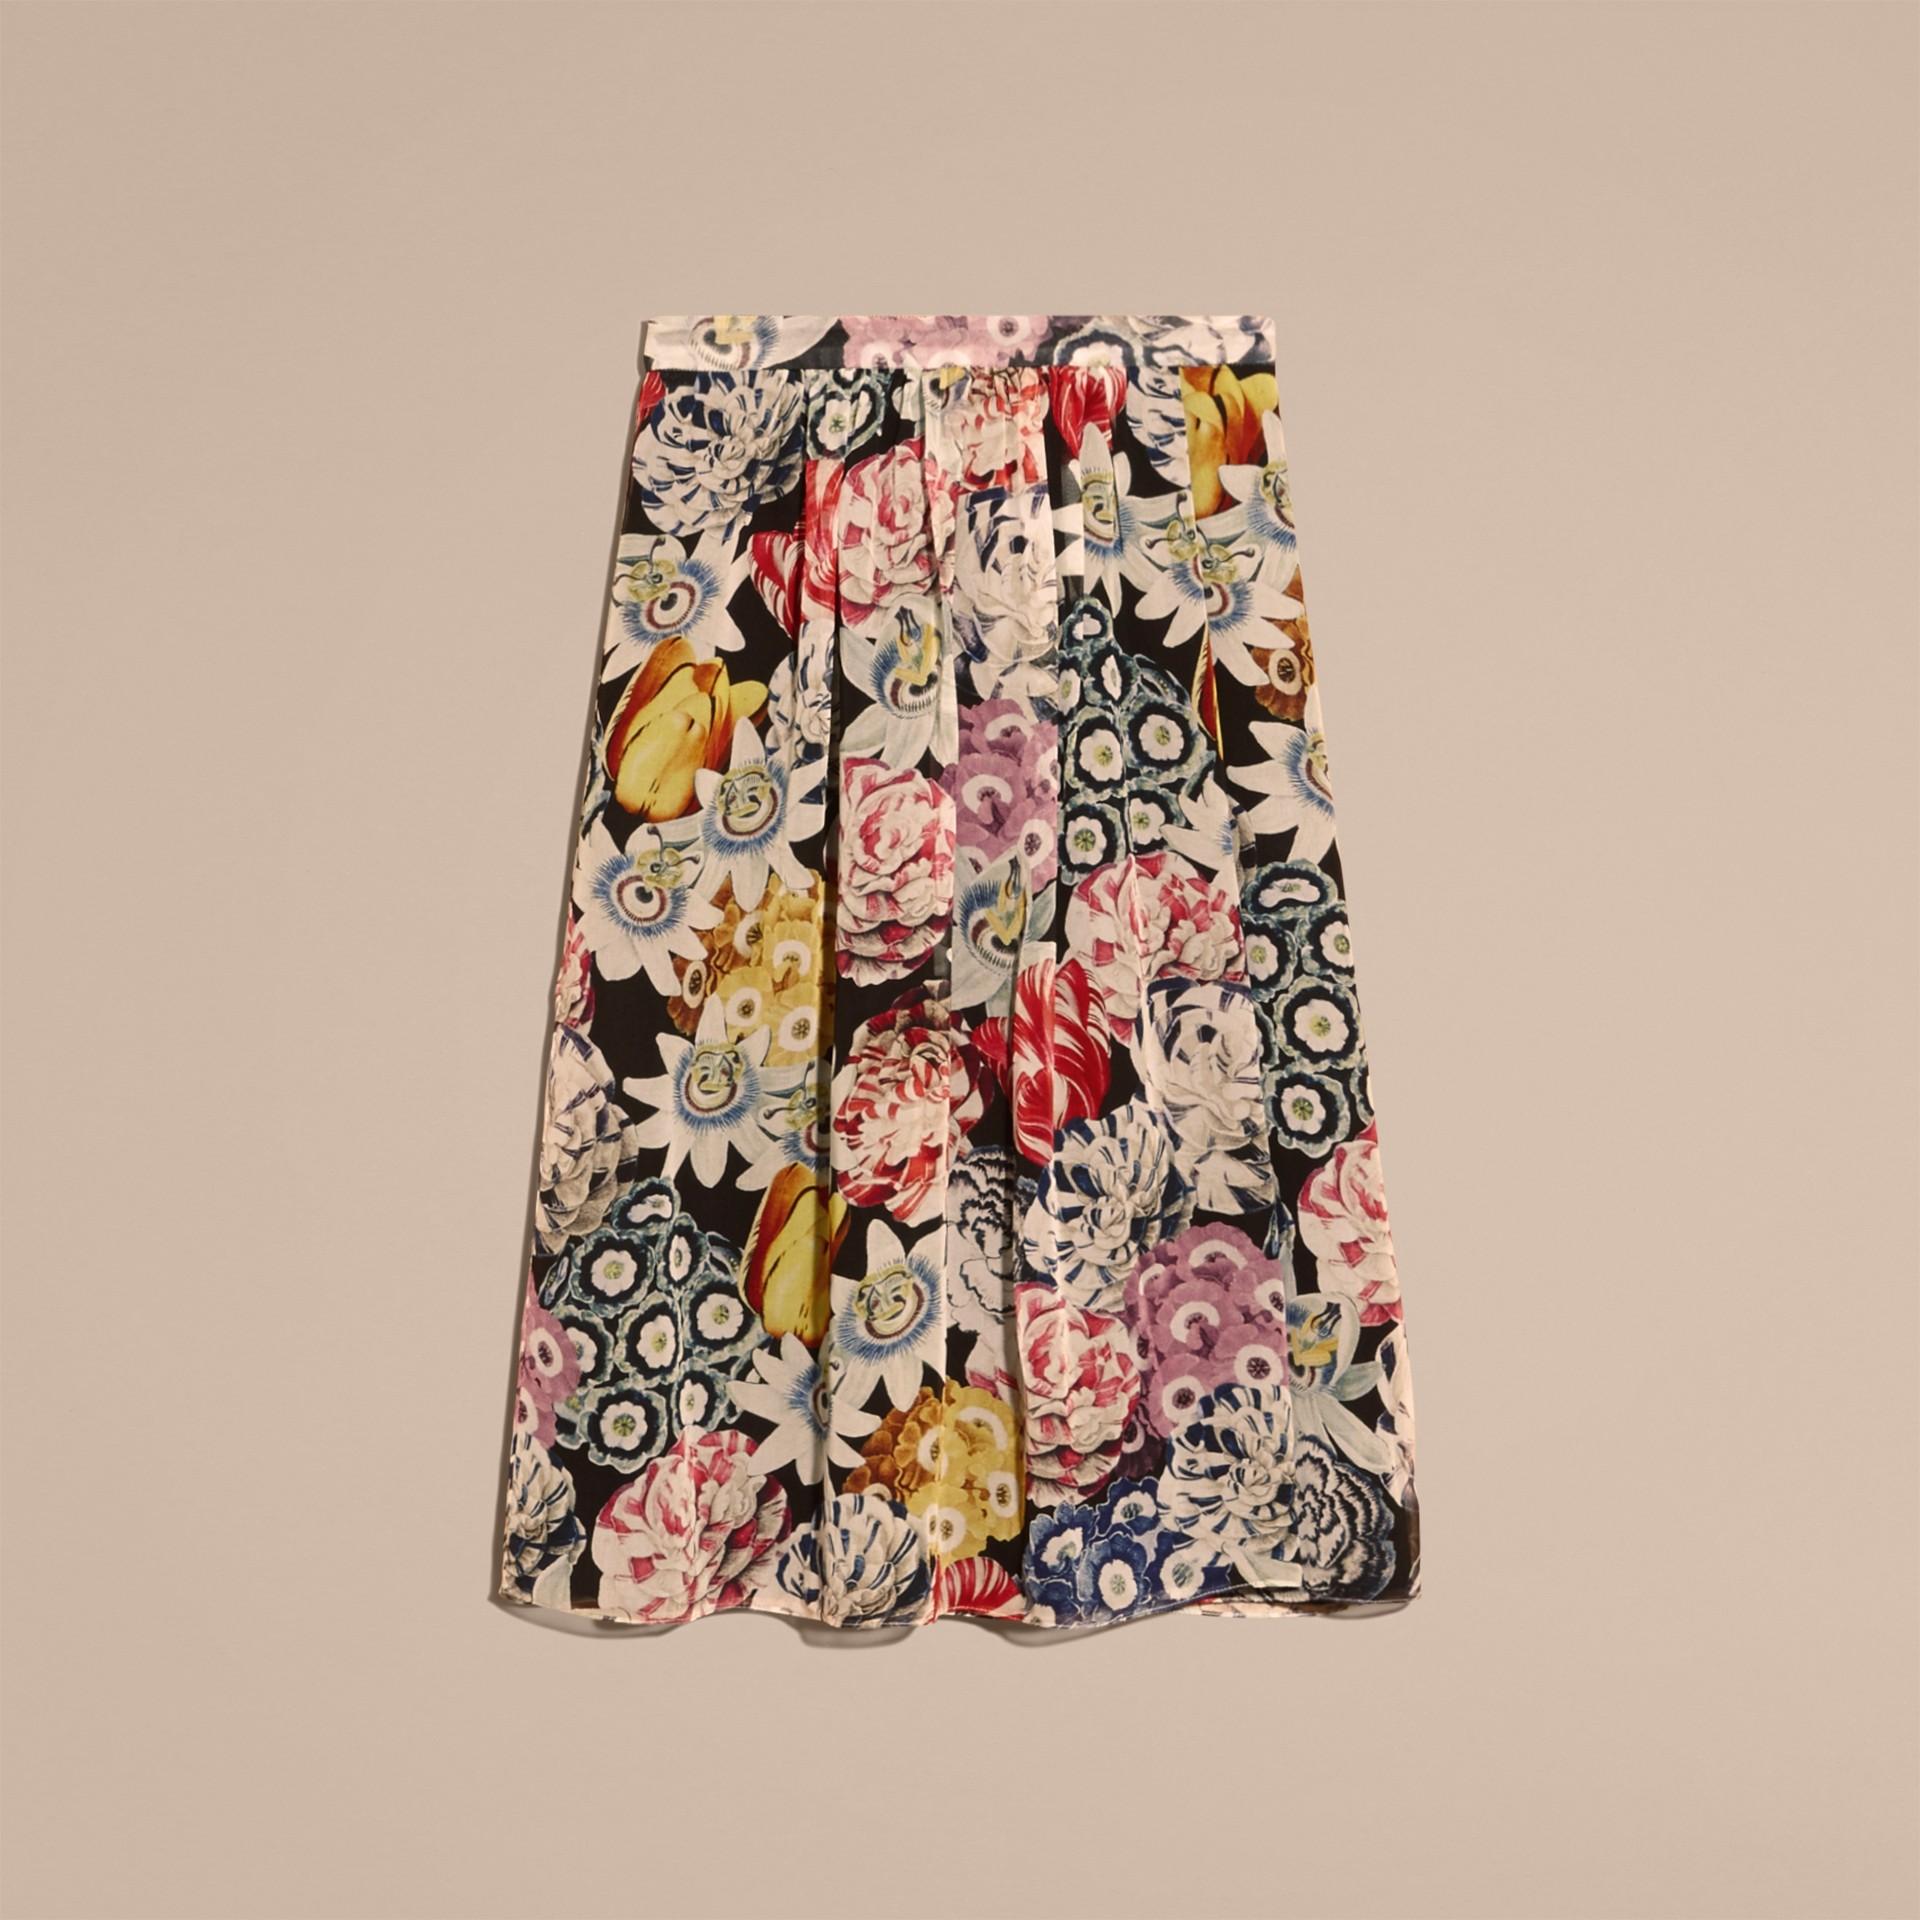 Schwarz Geraffter Seidenrock mit floralem Muster - Galerie-Bild 4